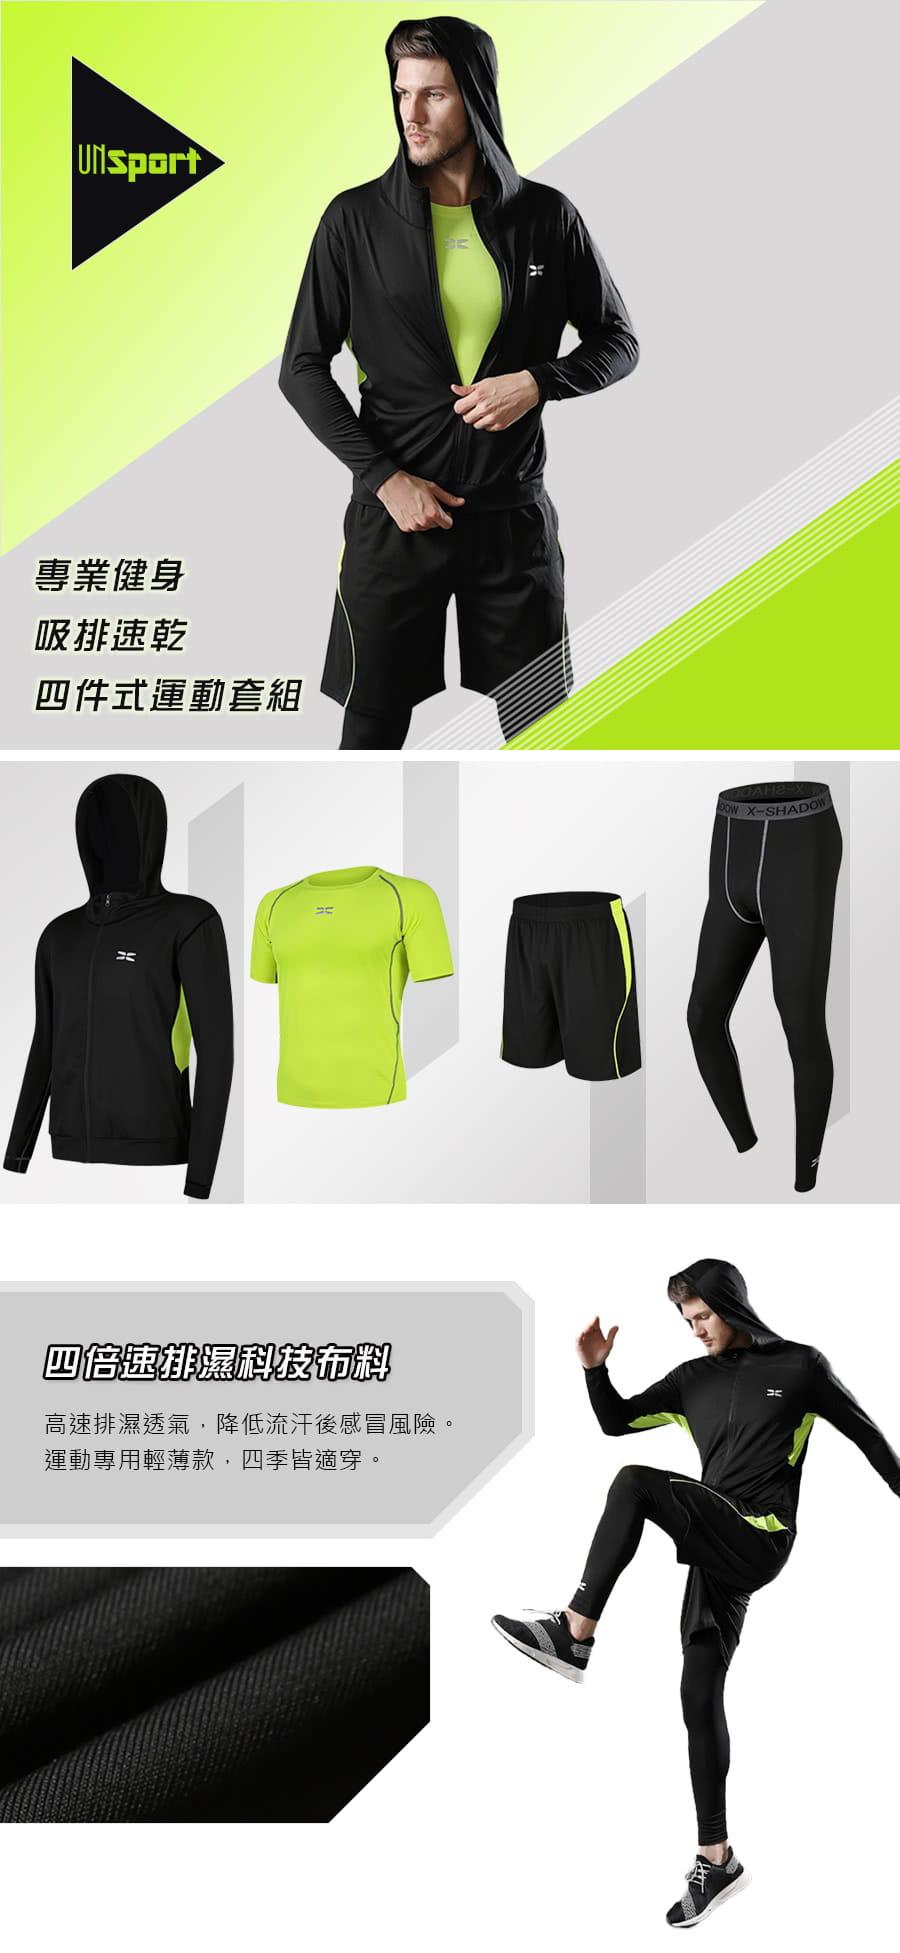 【Un-Sport 高機能】專業健身吸排速乾四件式運動套組(外套+短袖+短褲+緊身長褲) 1